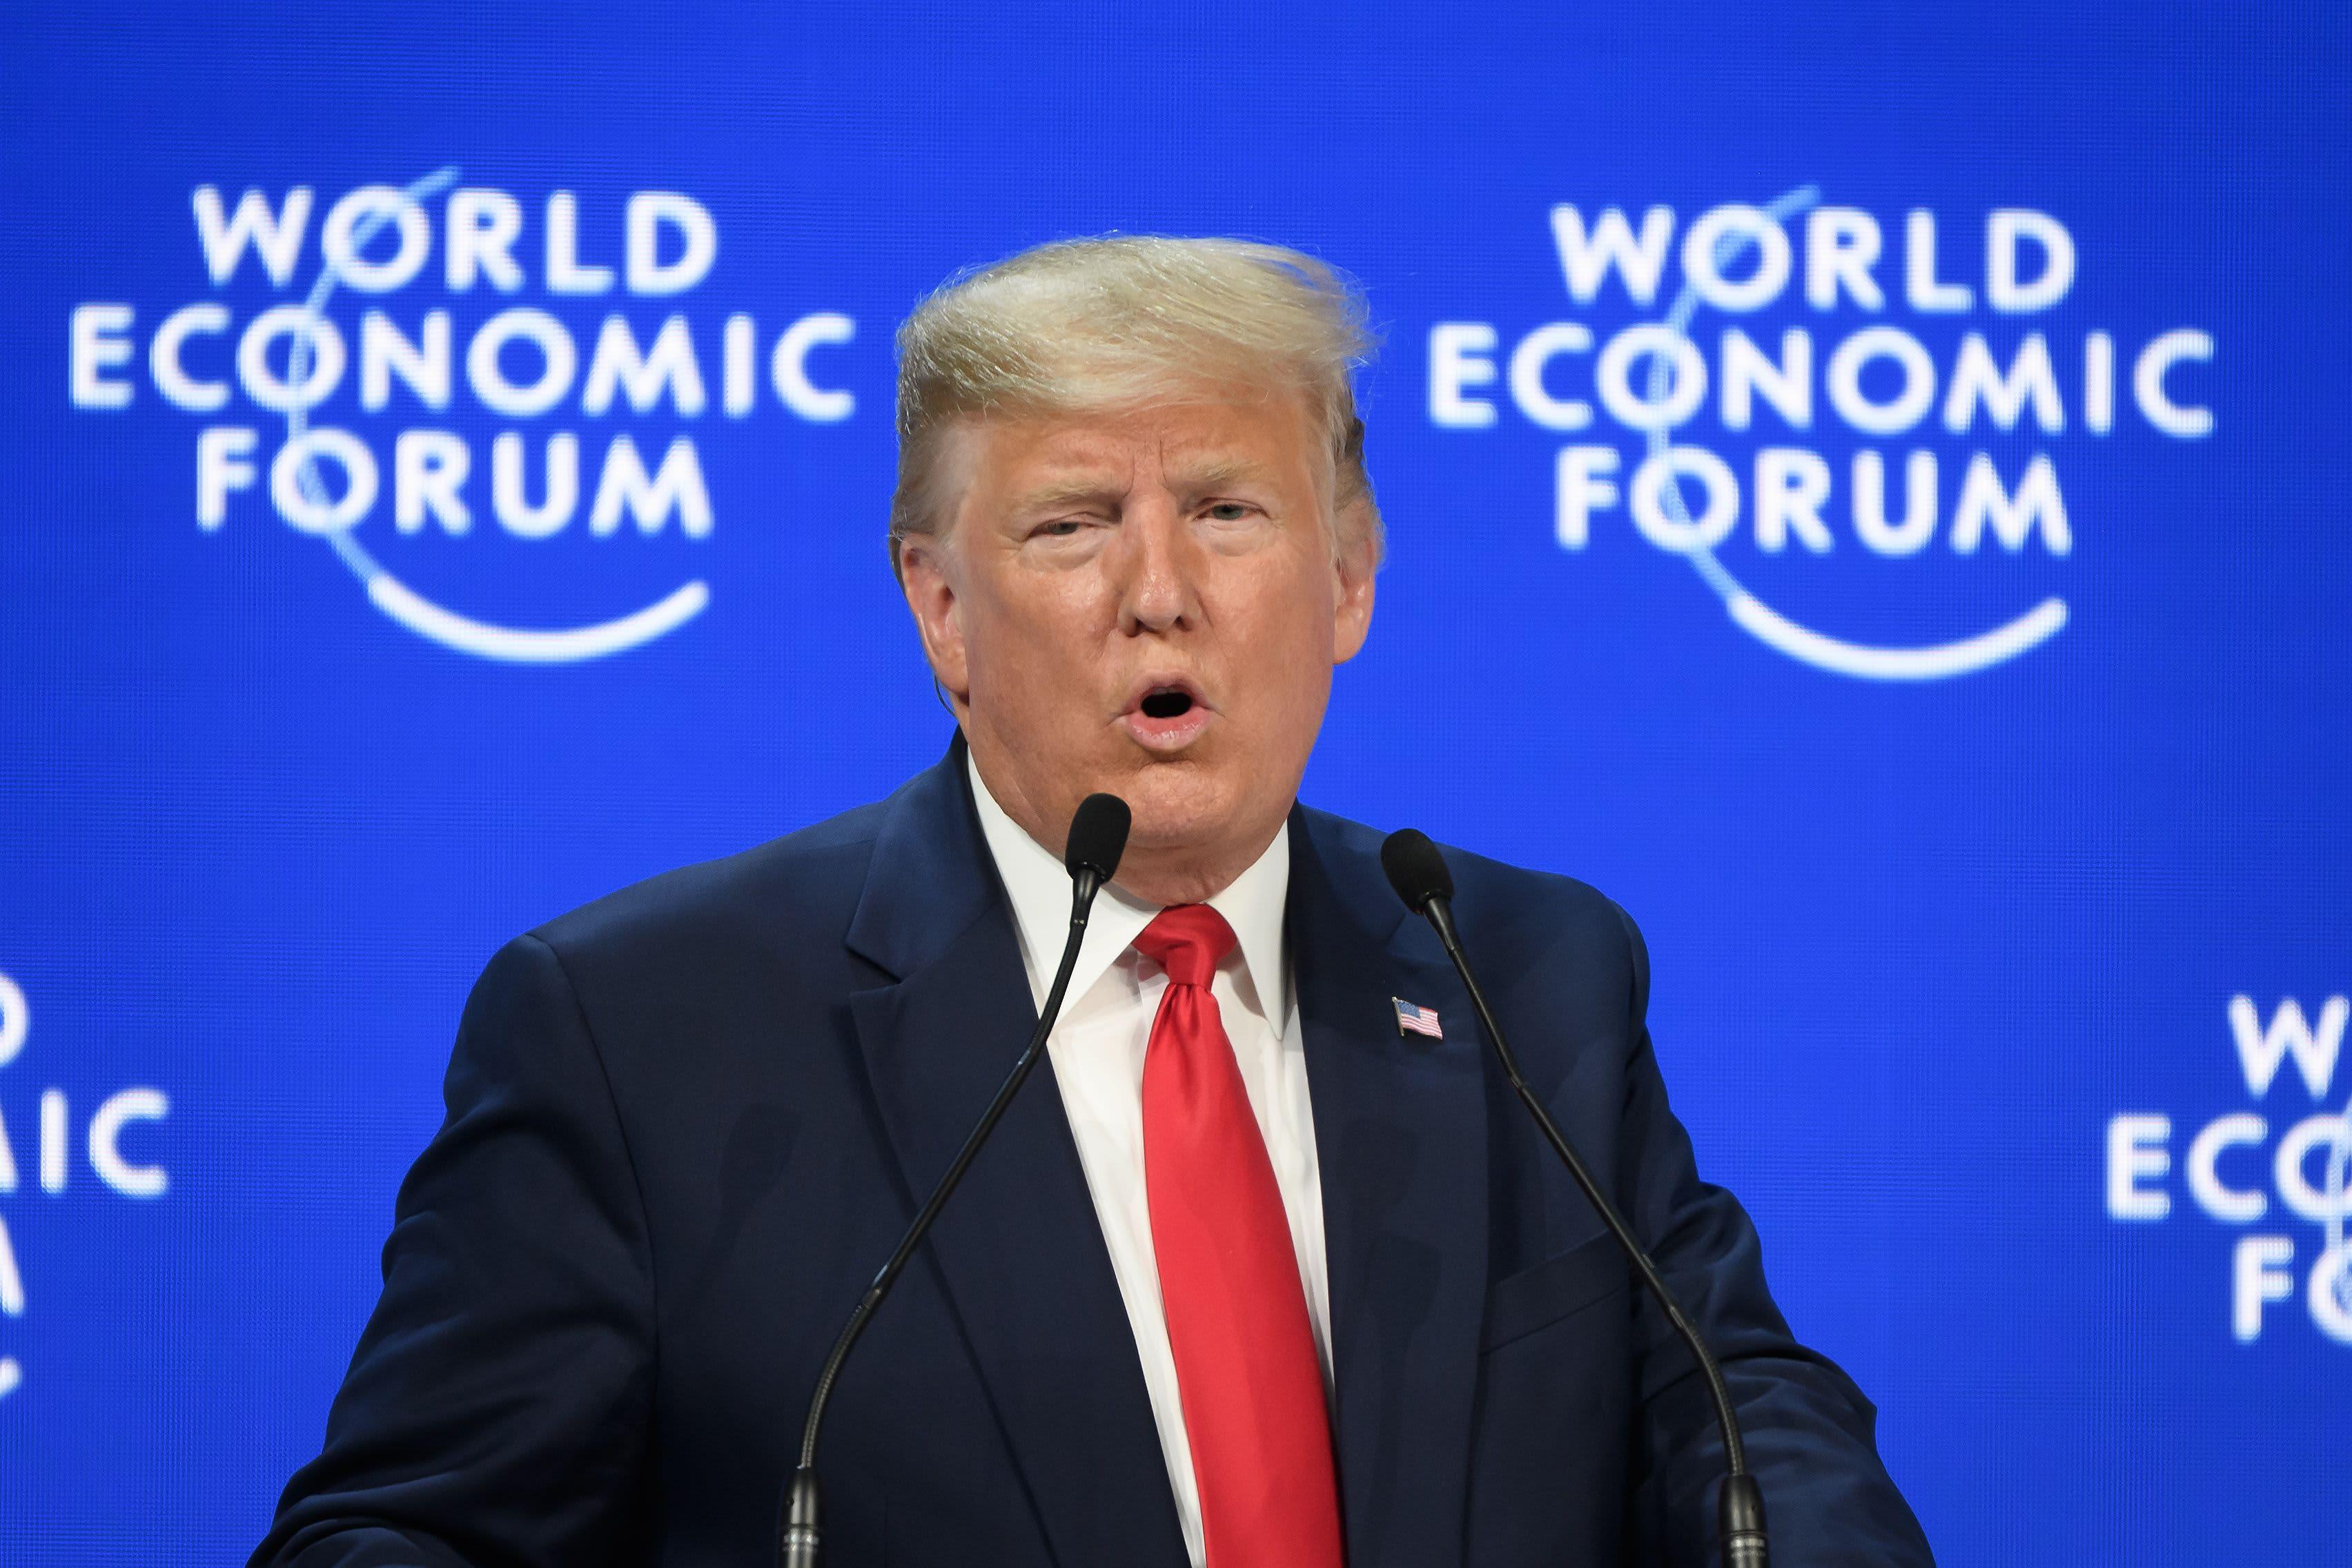 A 'pre-election speech': Attendees react to Trump's Davos address thumbnail